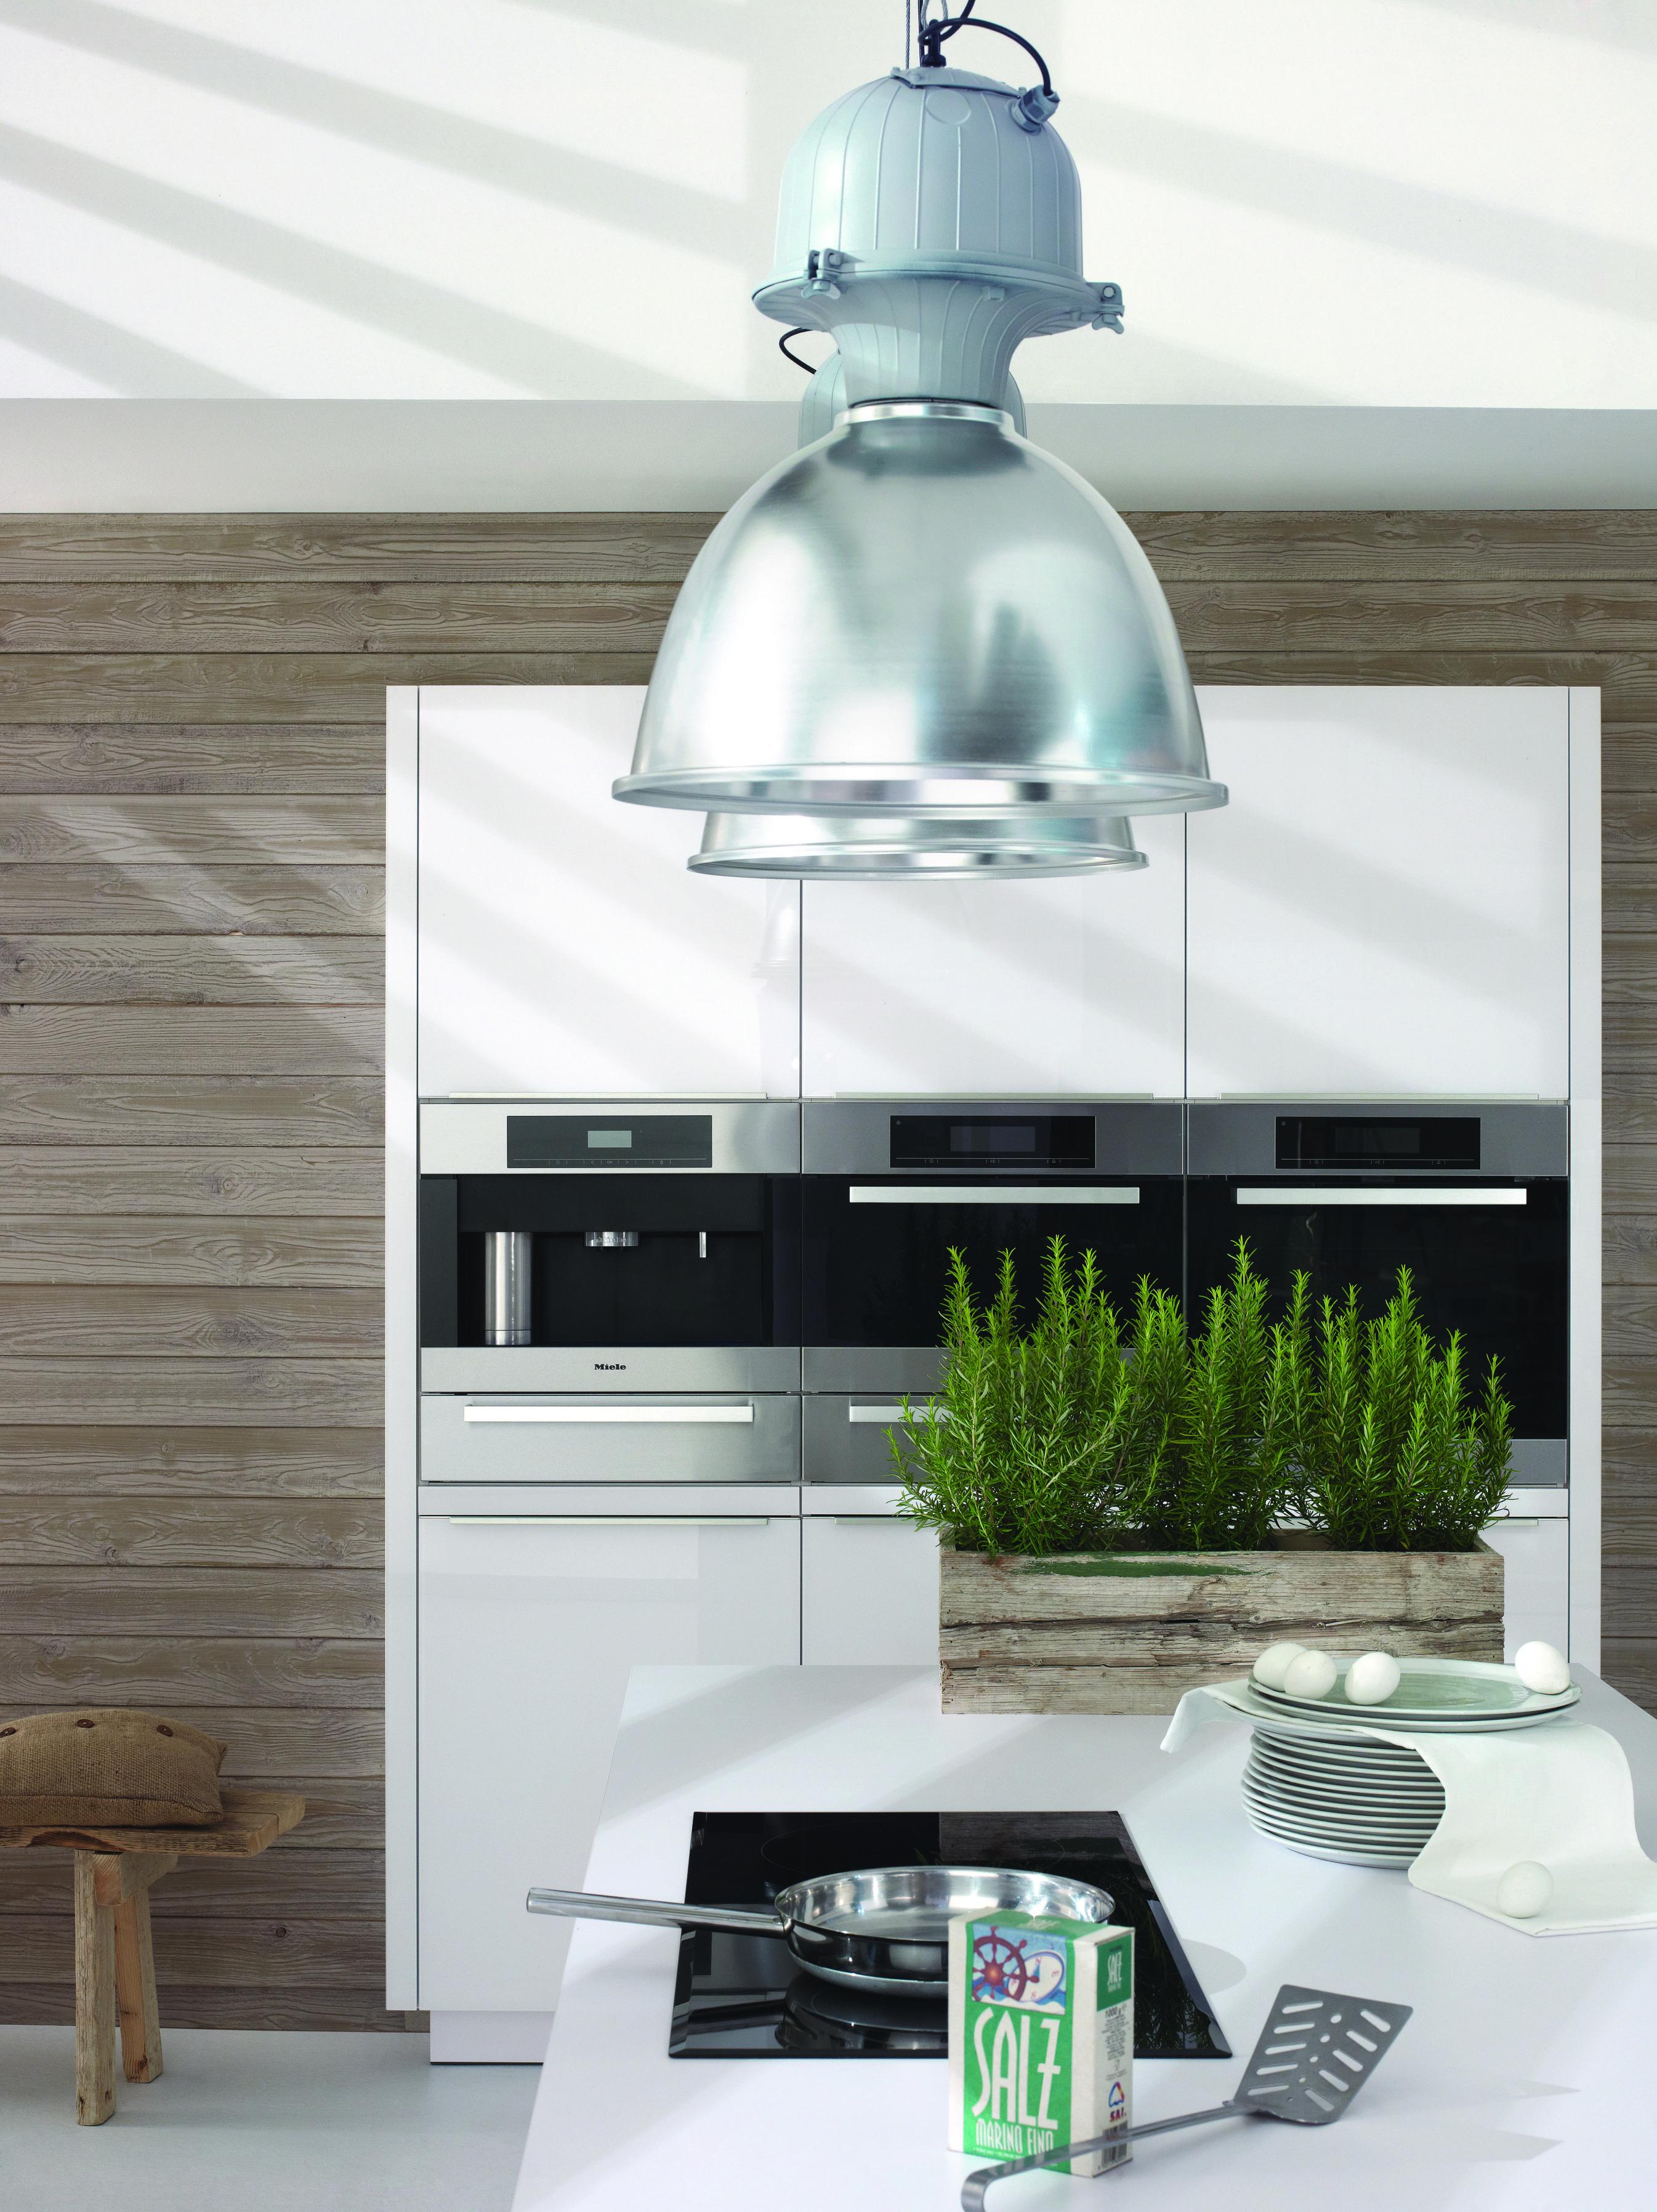 About alno modern kitchens on pinterest modern kitchen cabinets - Alno Kitchen Ranges The Ultimate In Modern German Kitchen Design